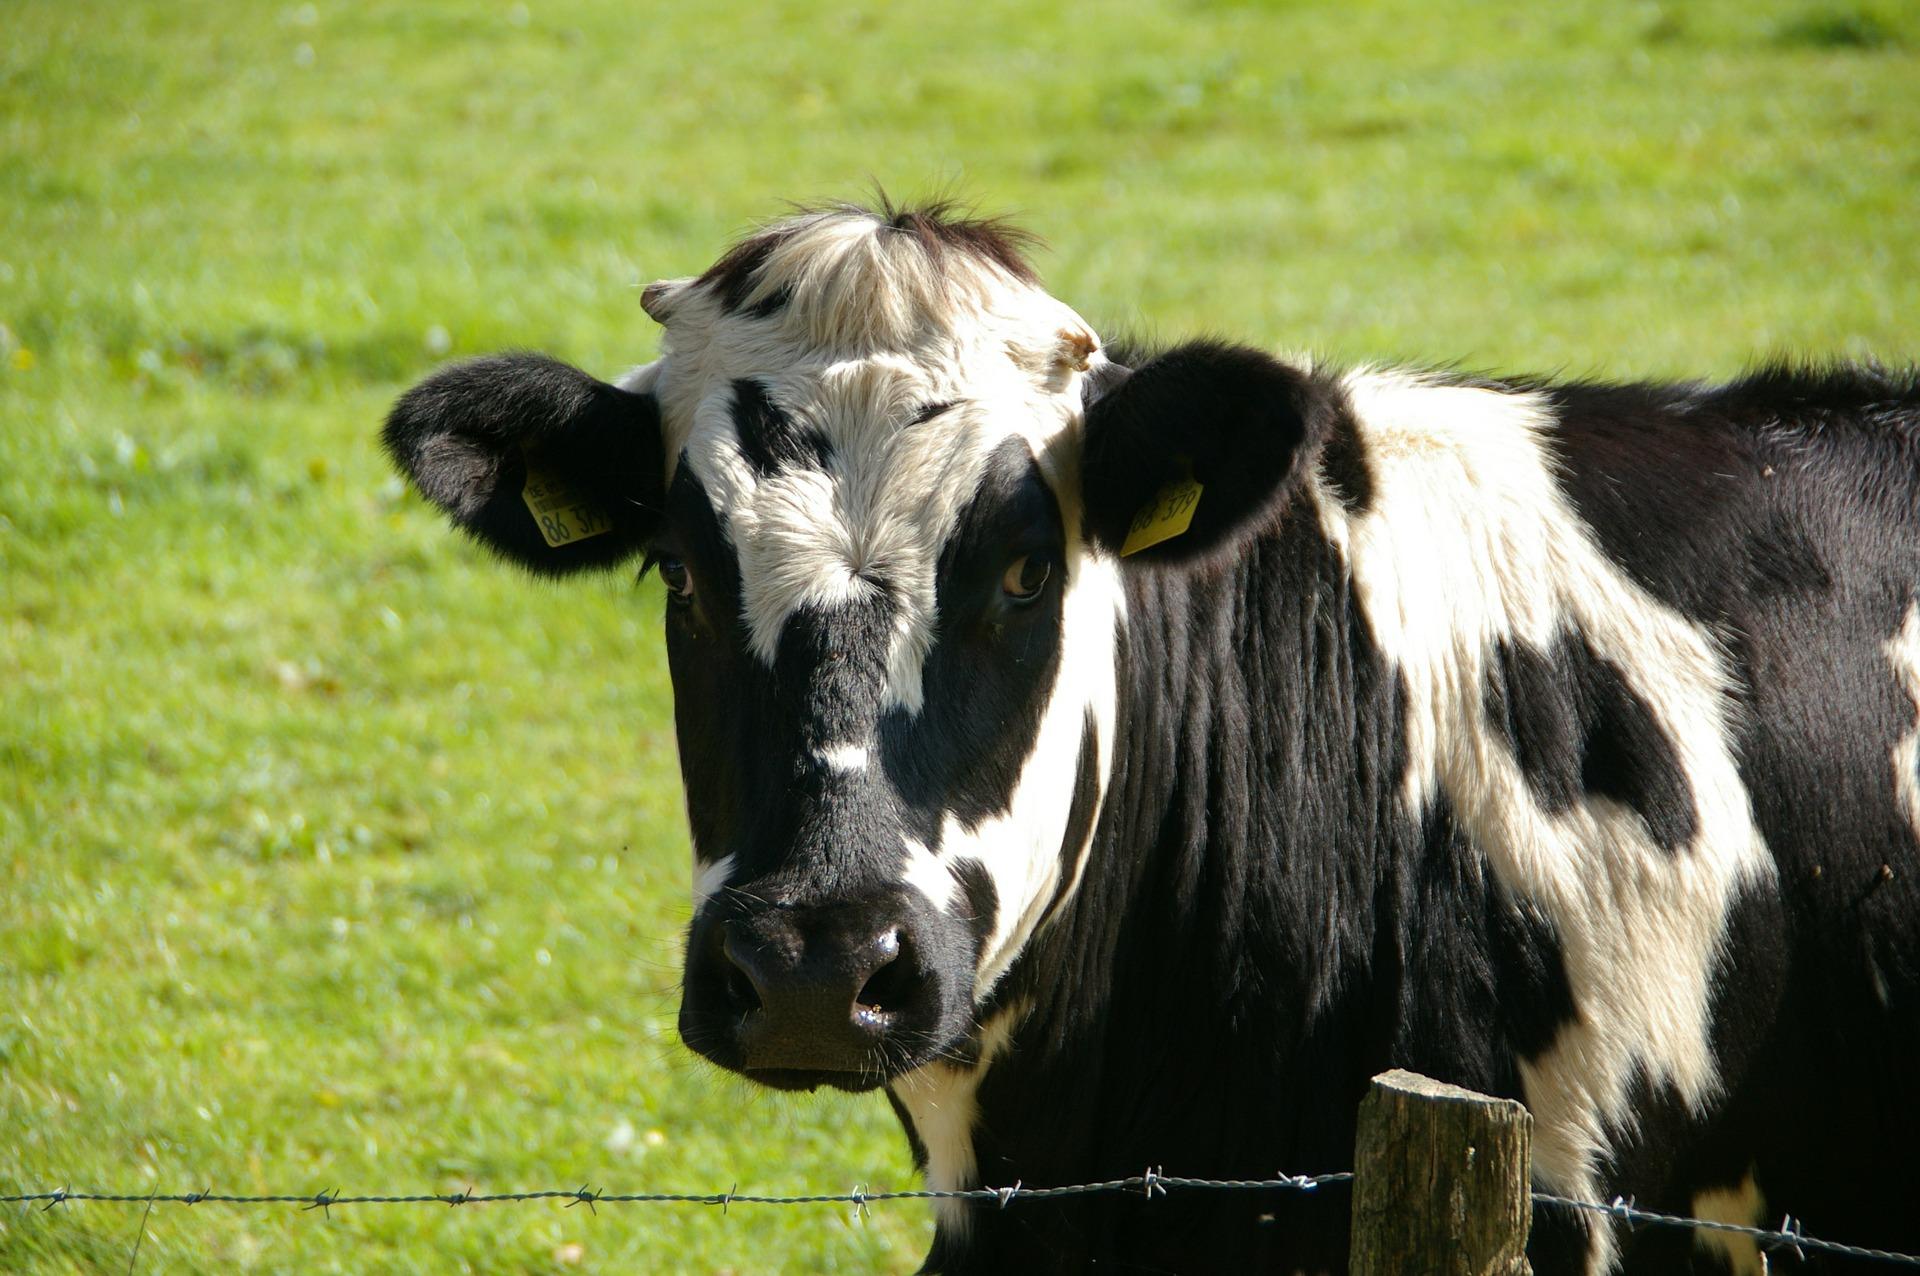 cow-234835_1920